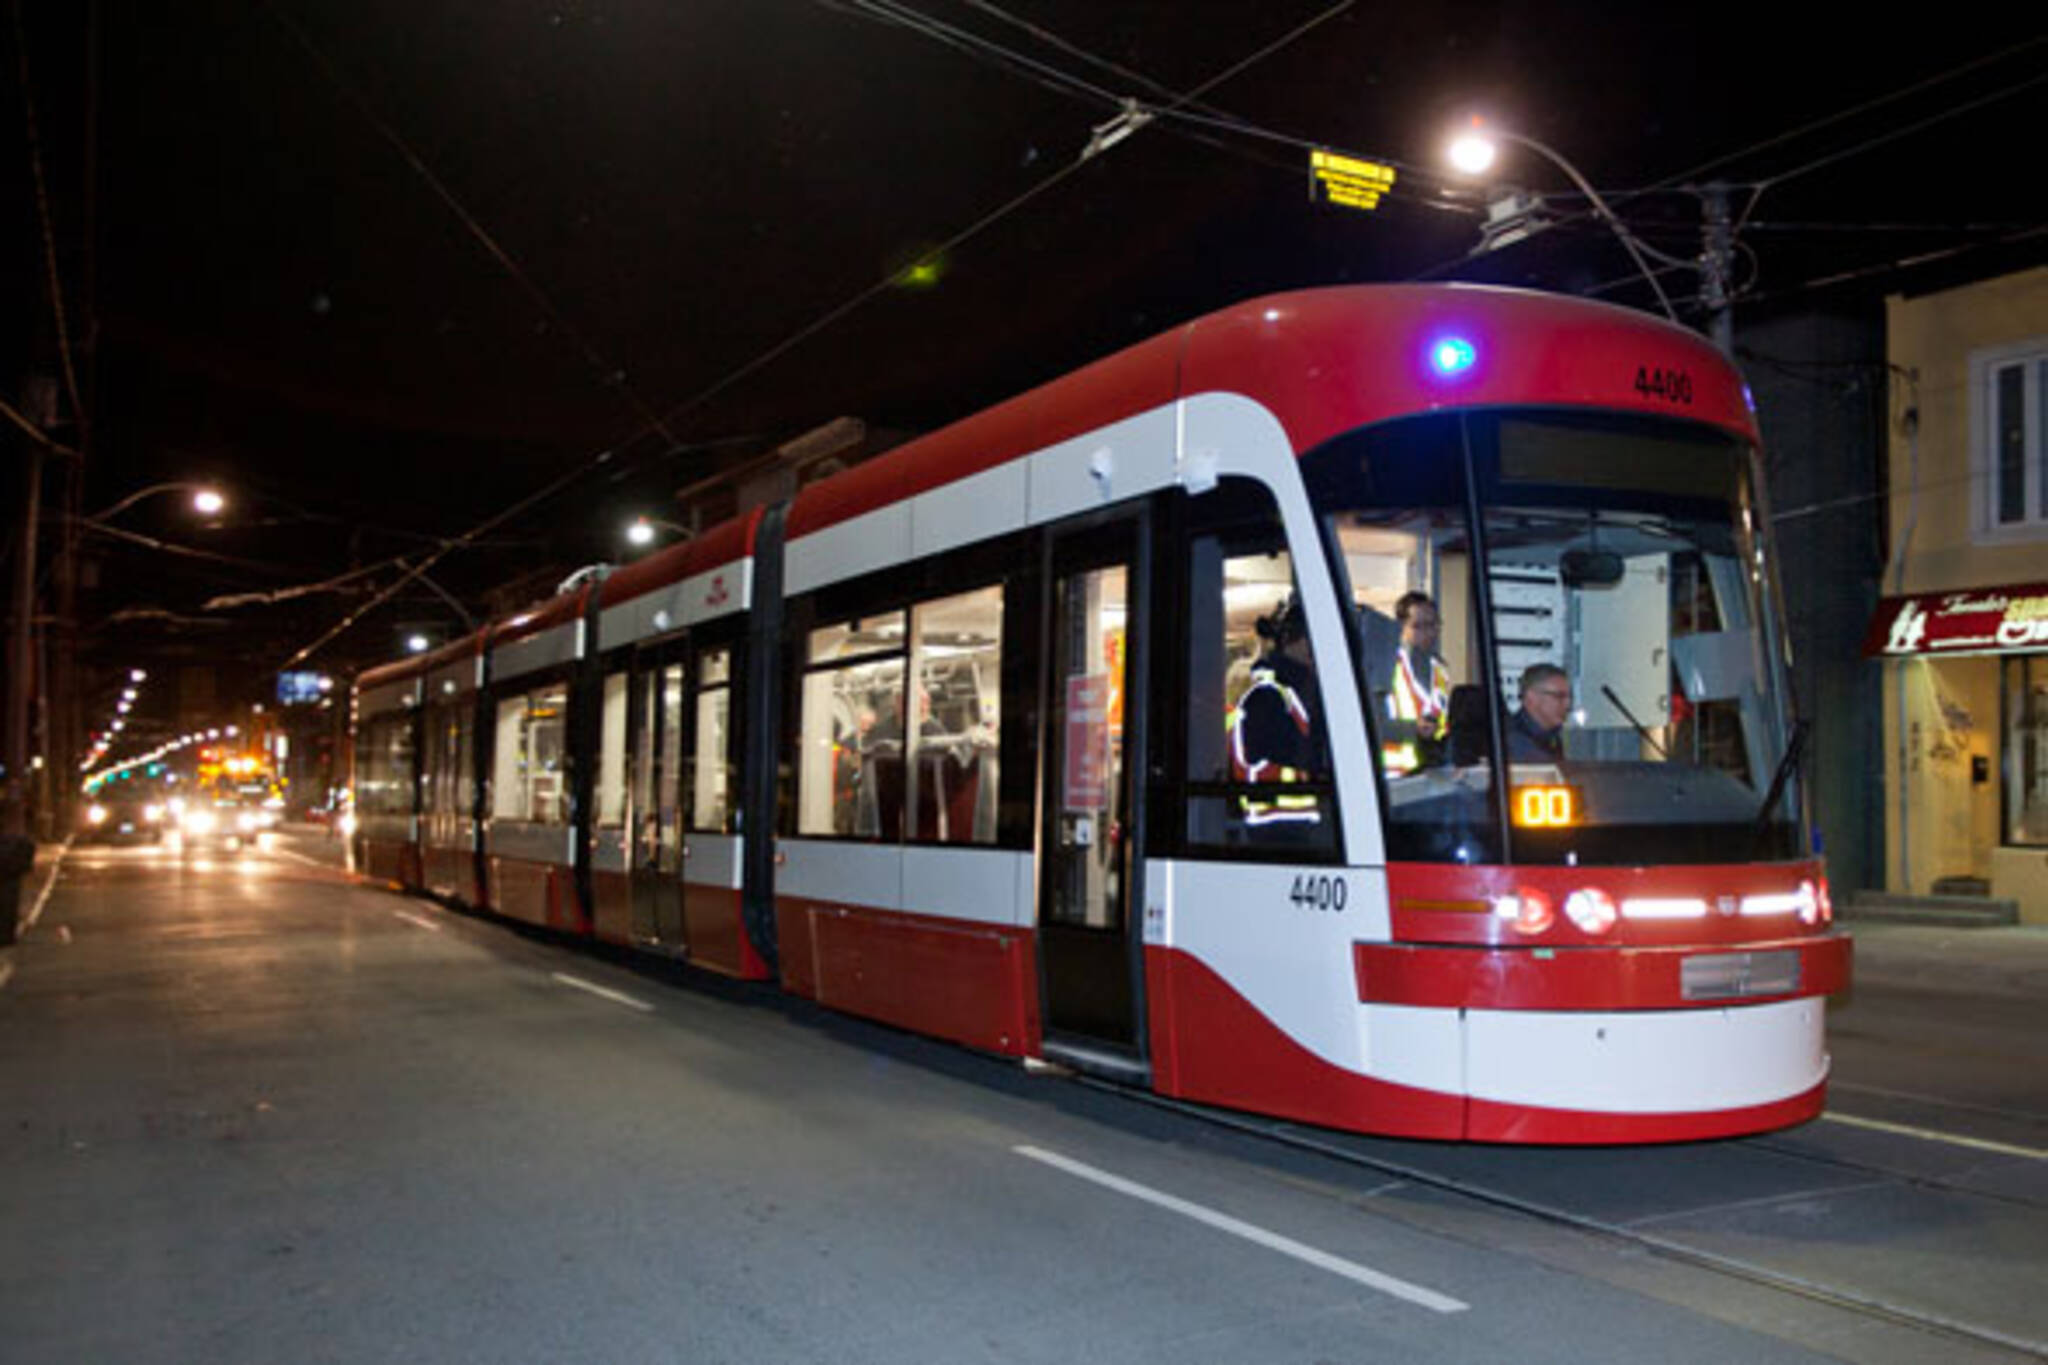 Ttc Conducts First Public Test Of New Streetcar